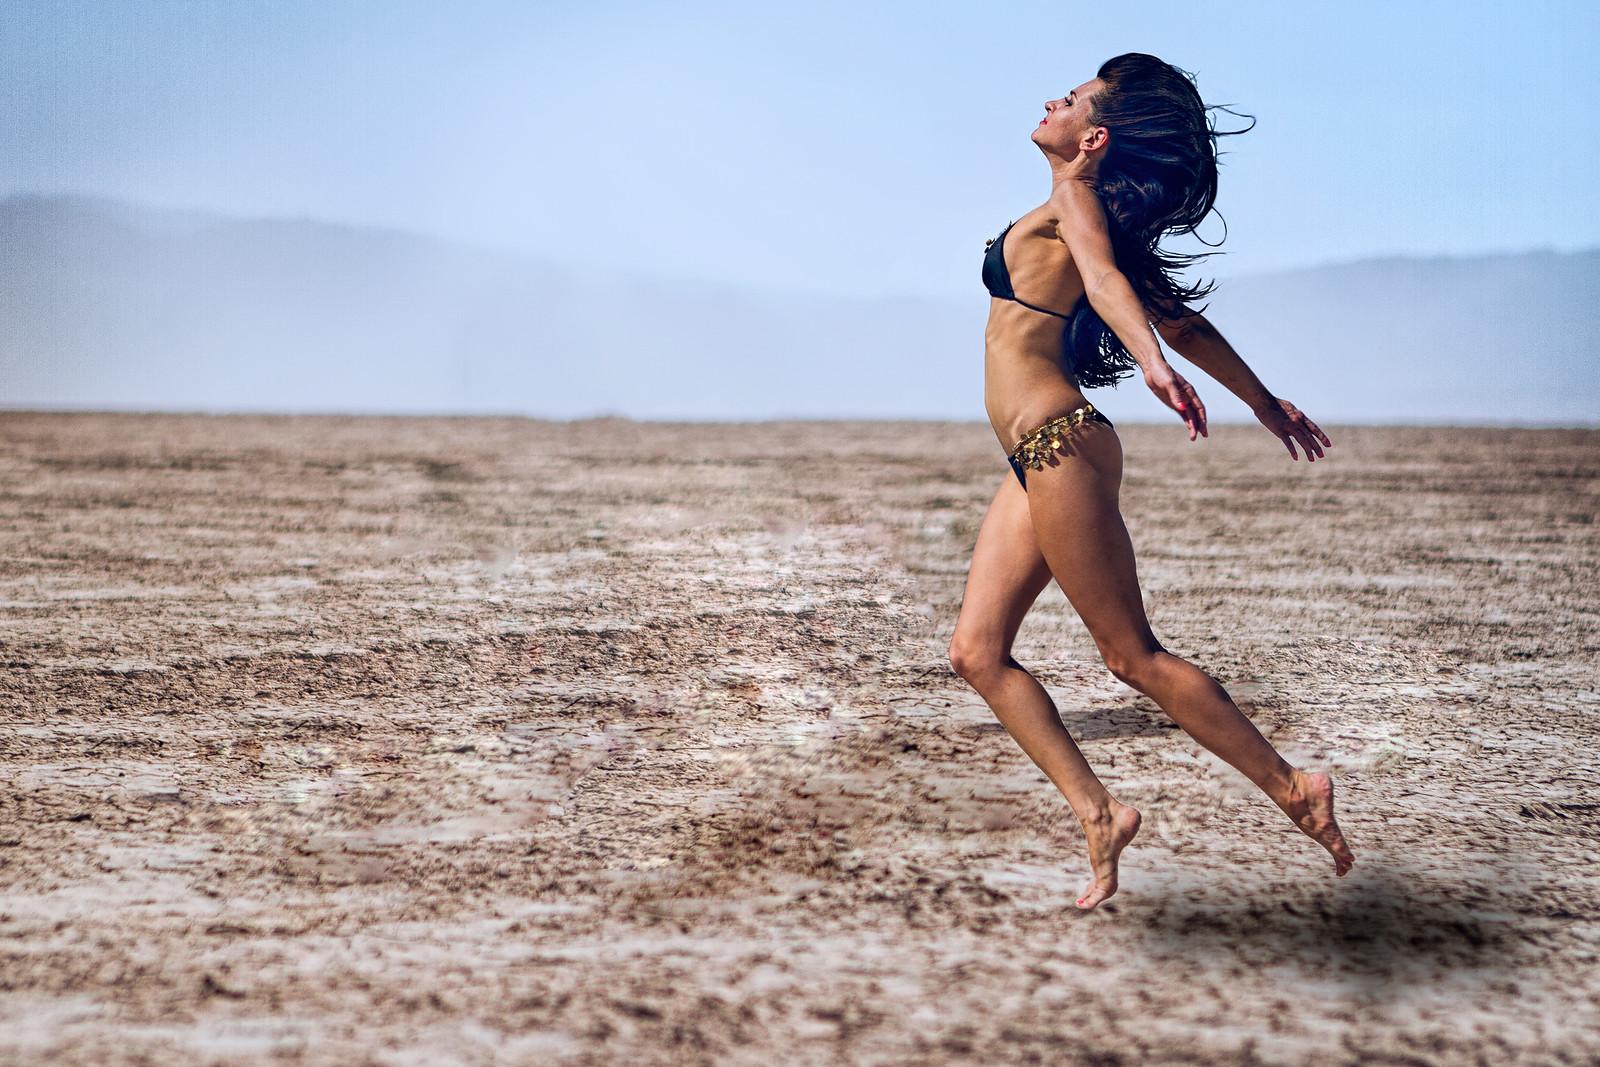 Bikini Desert Shoot